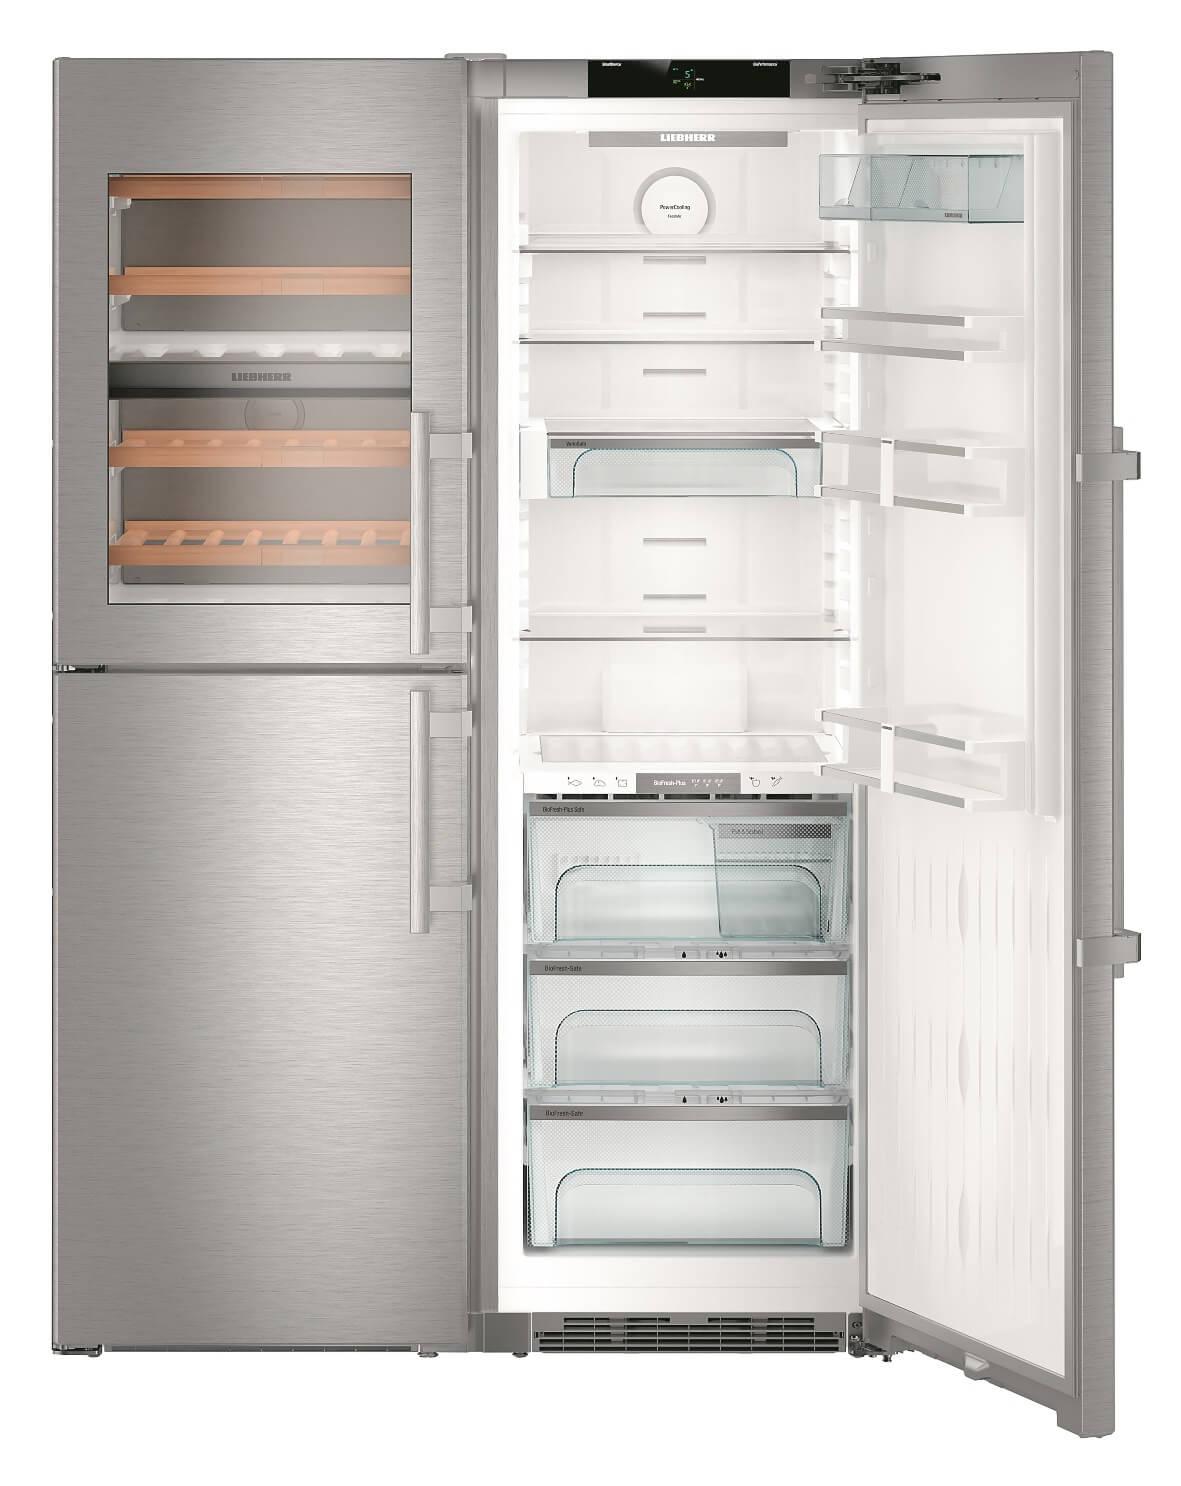 купить Side-by-Side холодильник Liebherr SBSes 8486 Украина фото 2